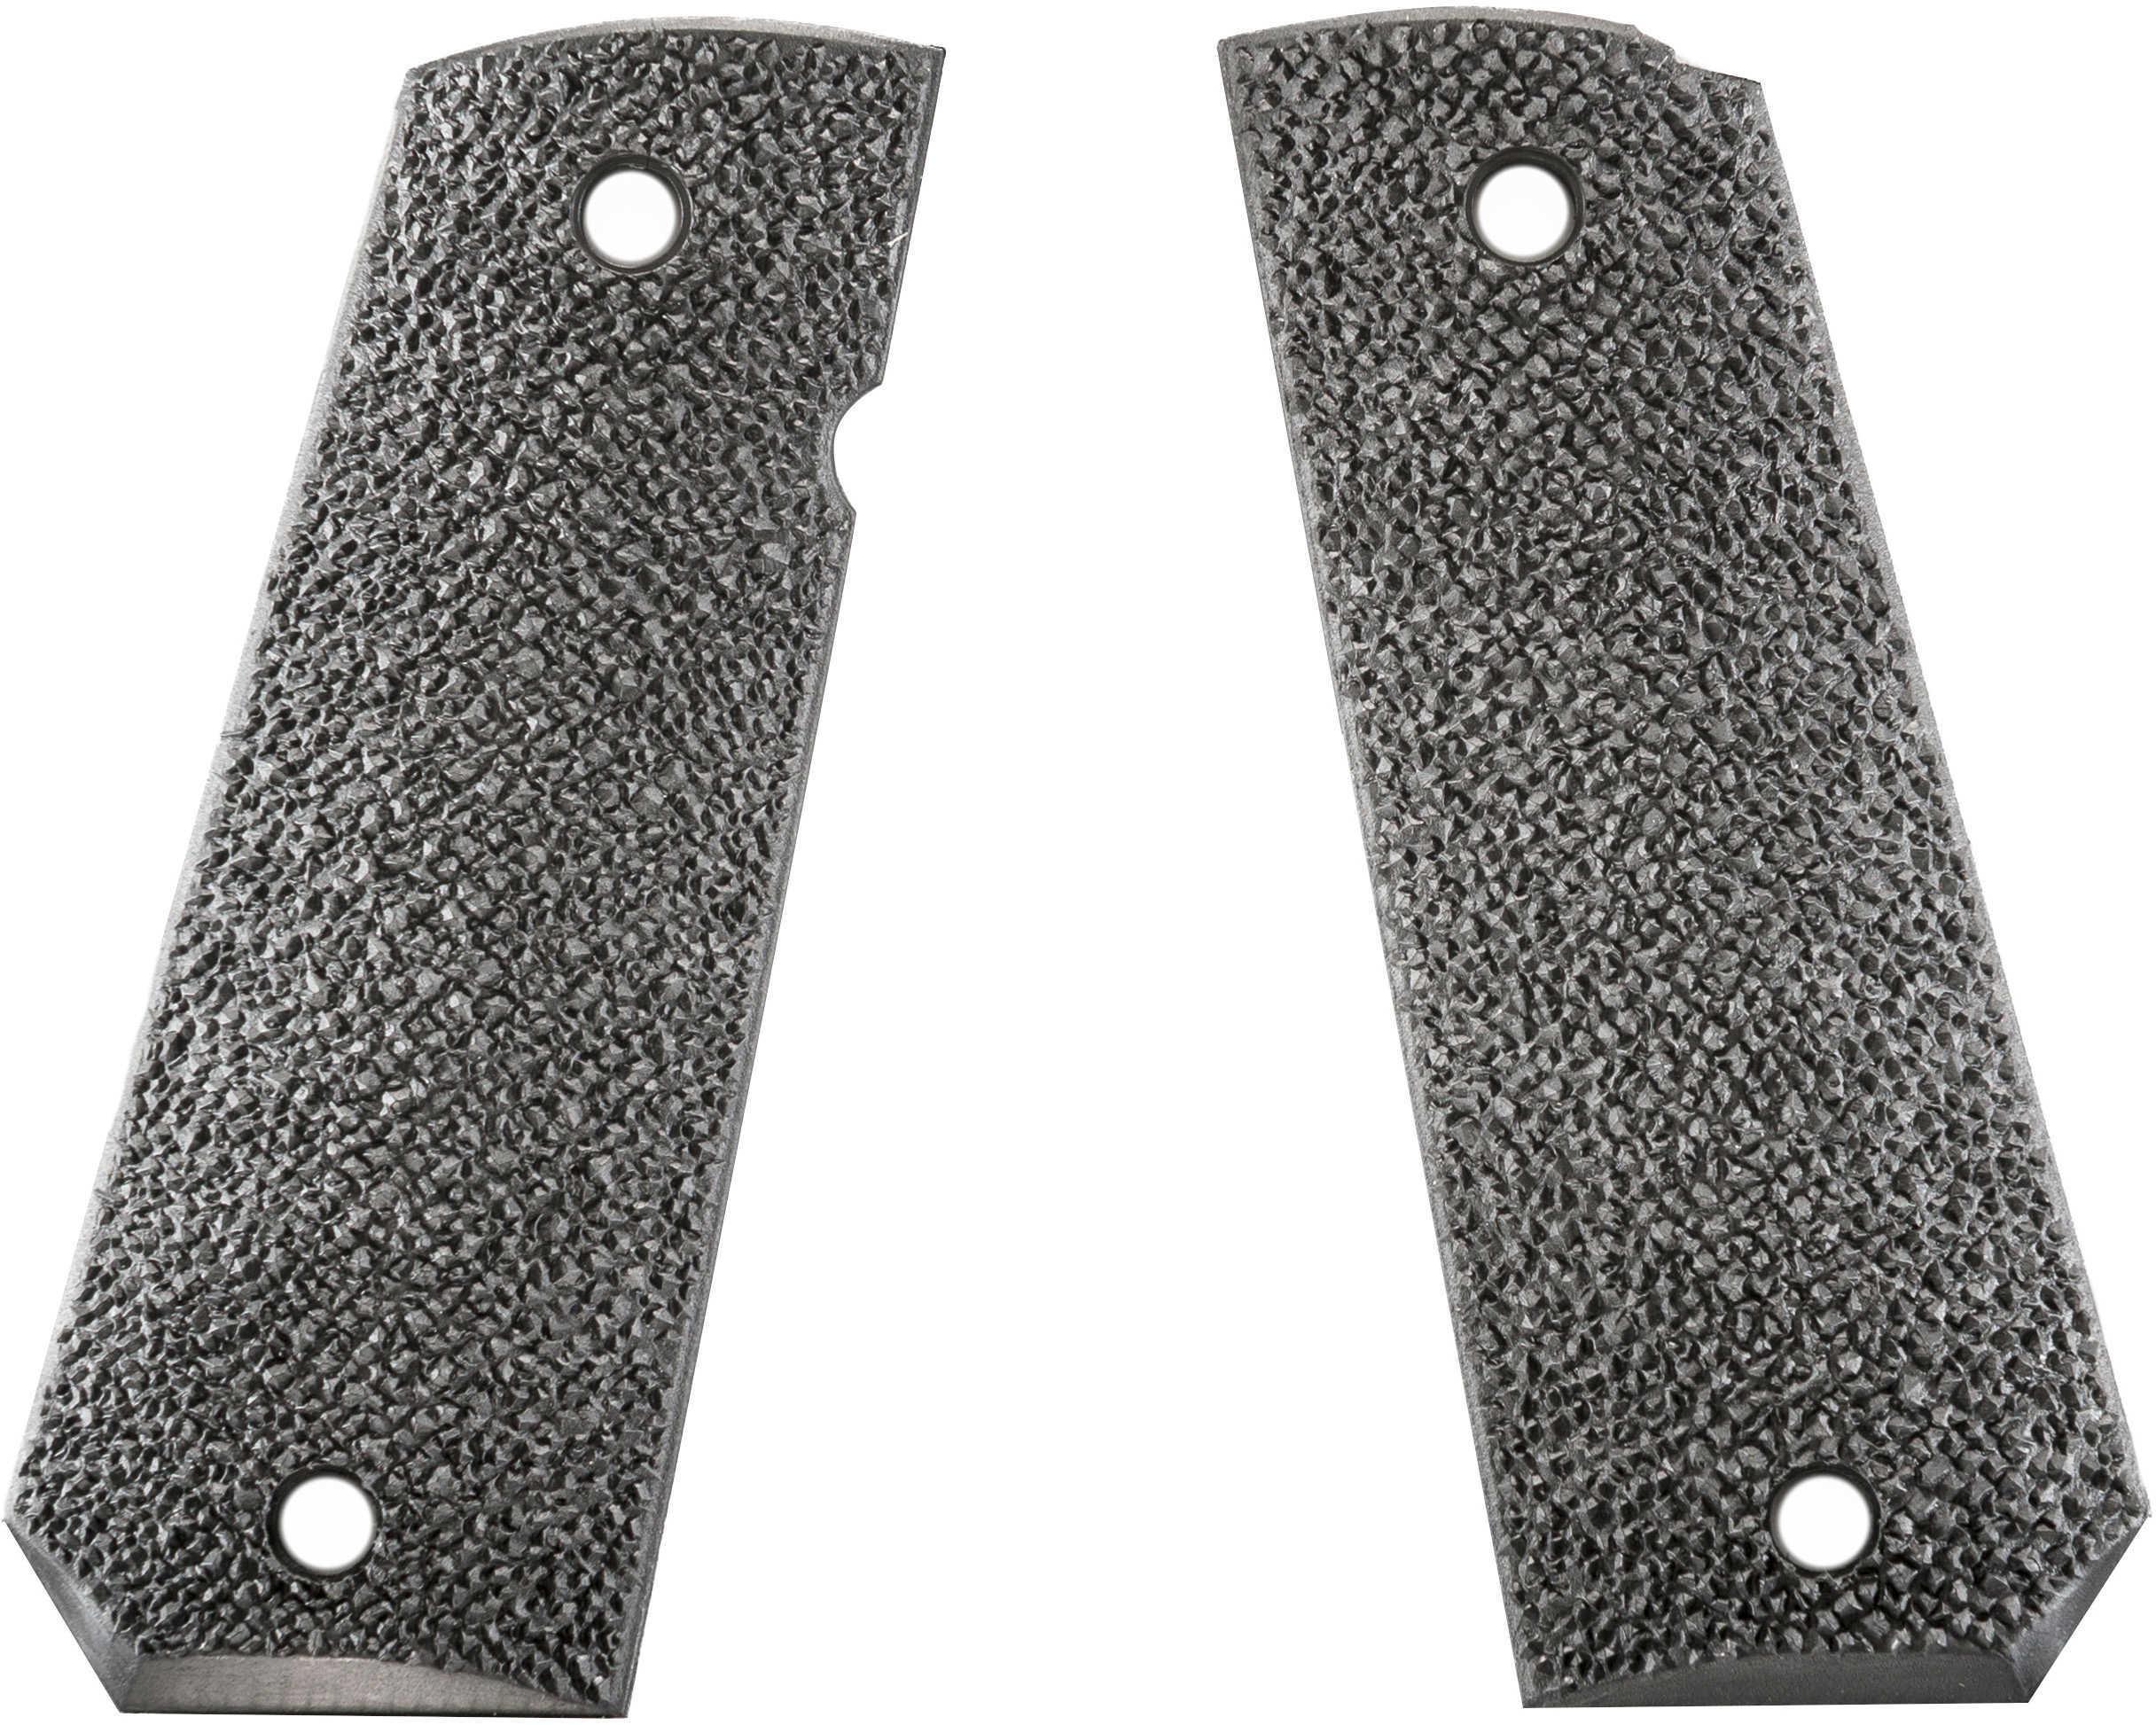 XTR 1911 Grip Hard Rubber 2-Piece, Black Md: 4511-Bk